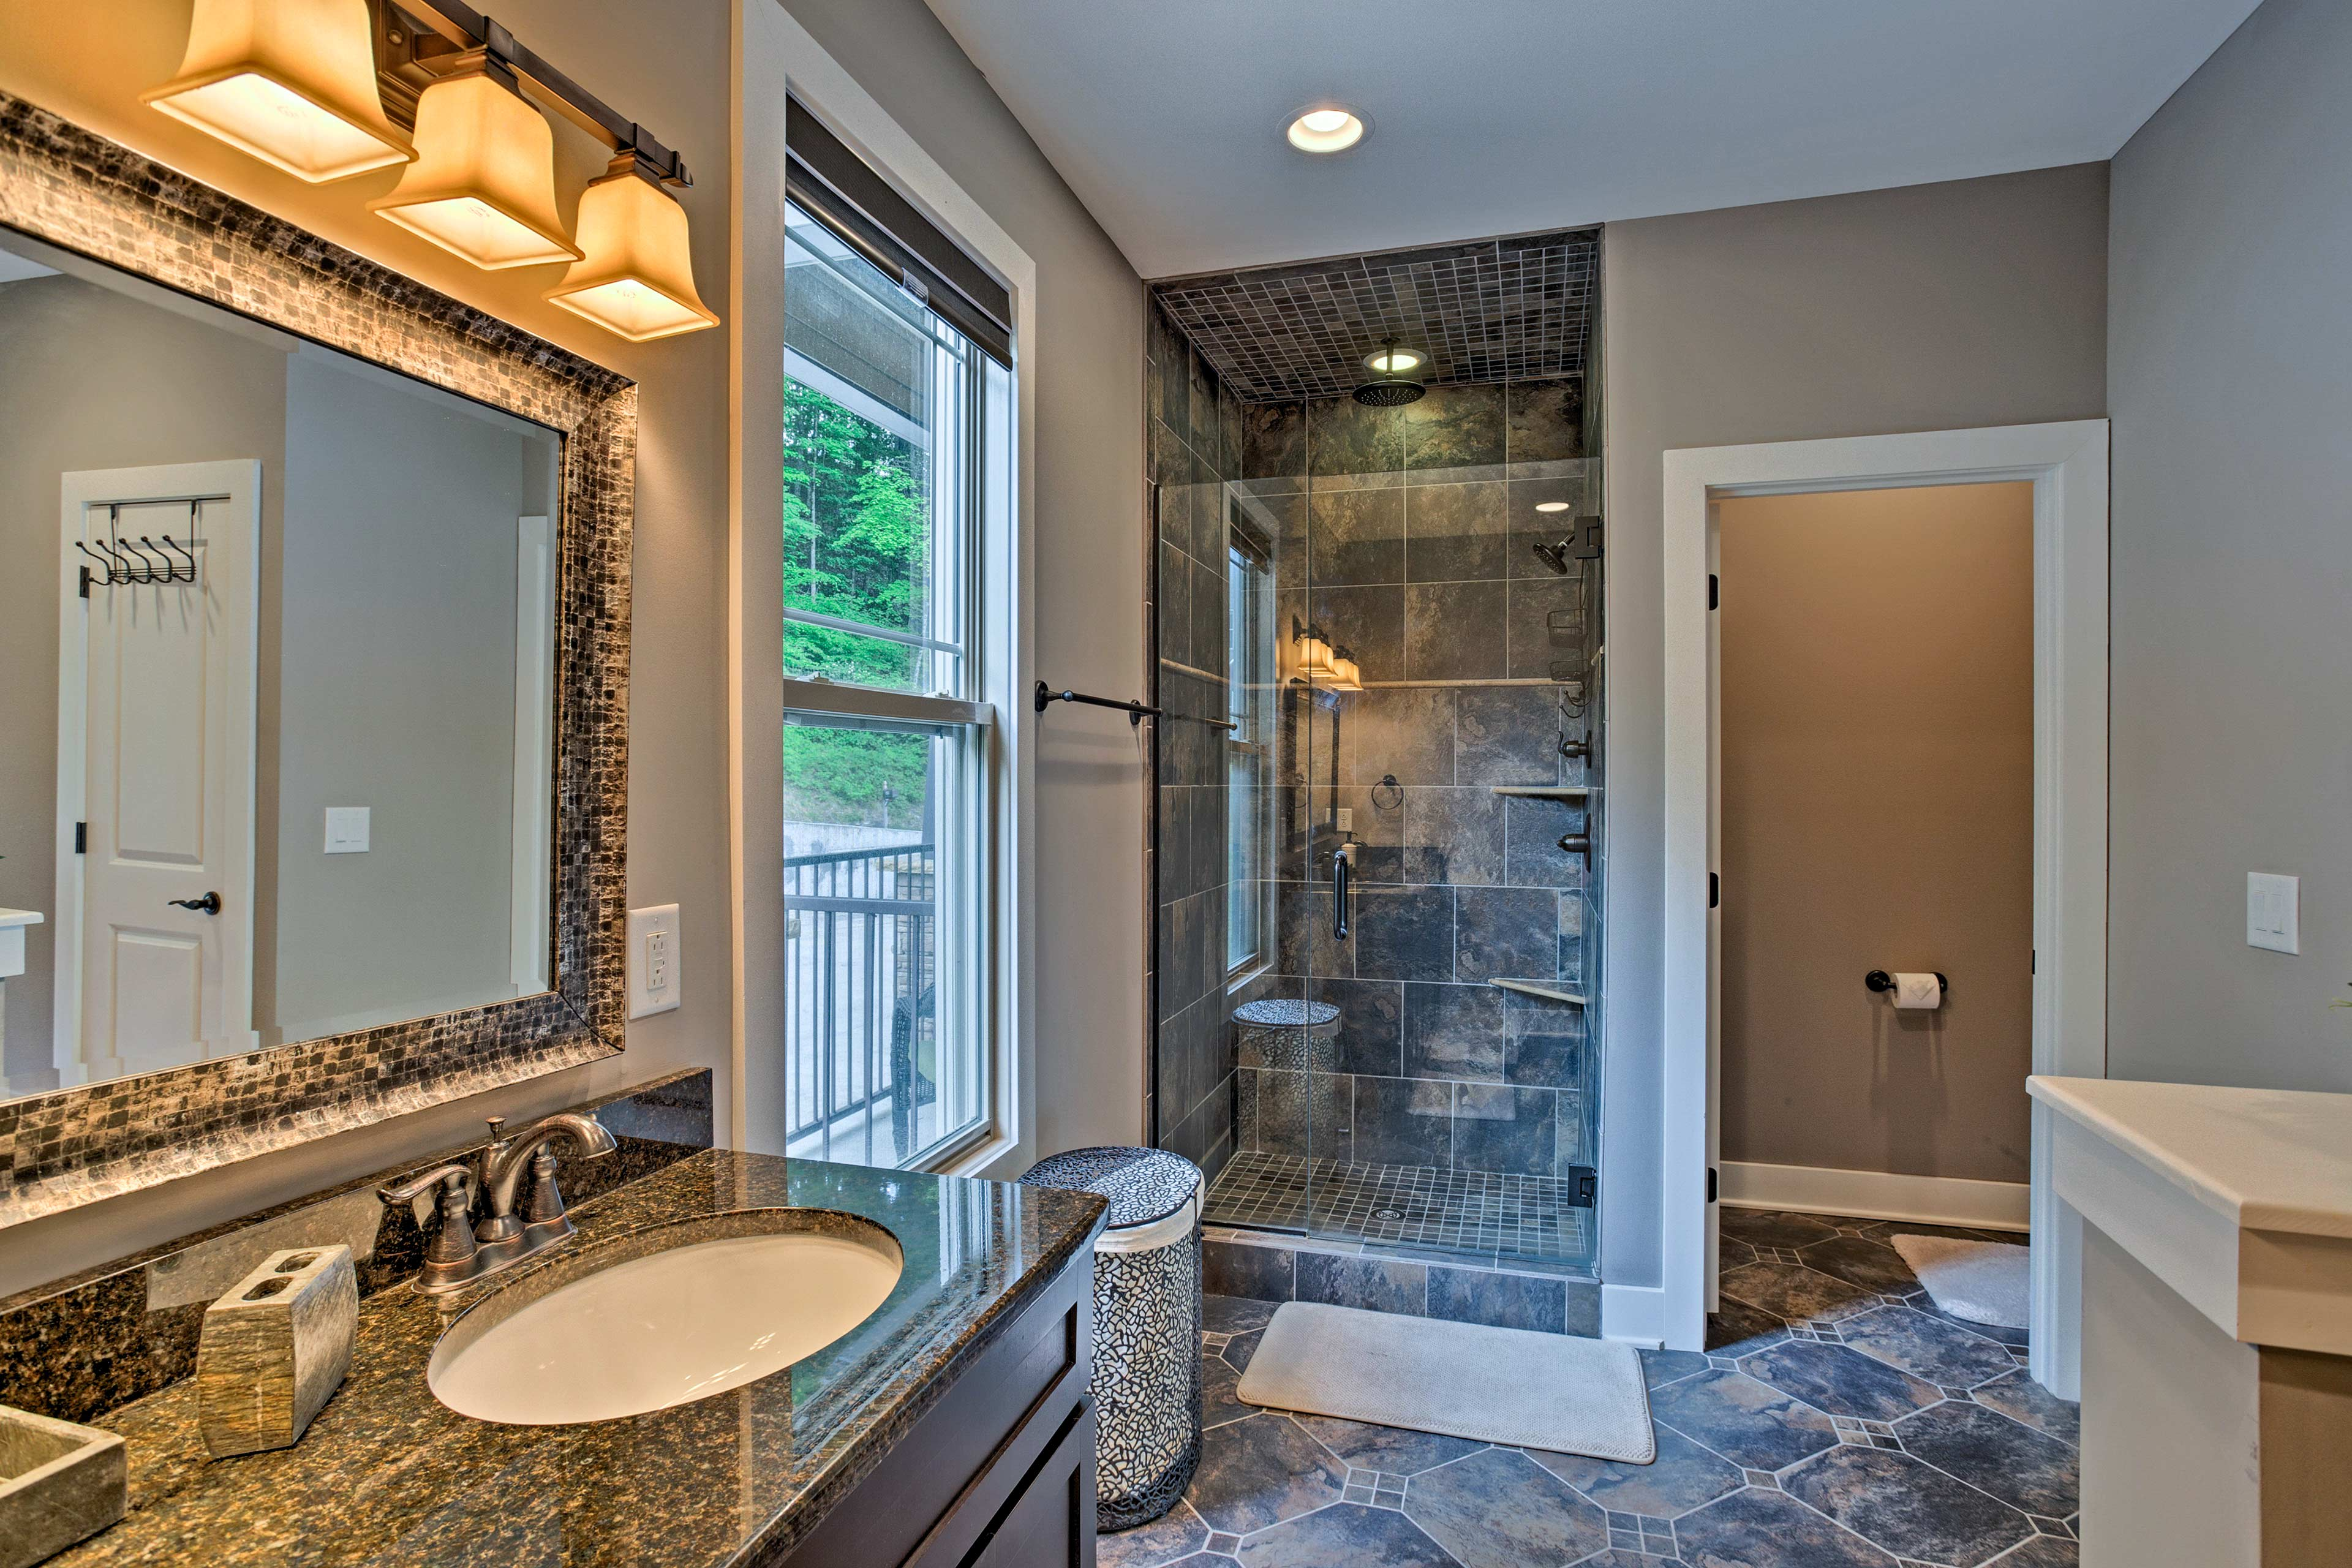 The en-suite also has a walk-in shower!